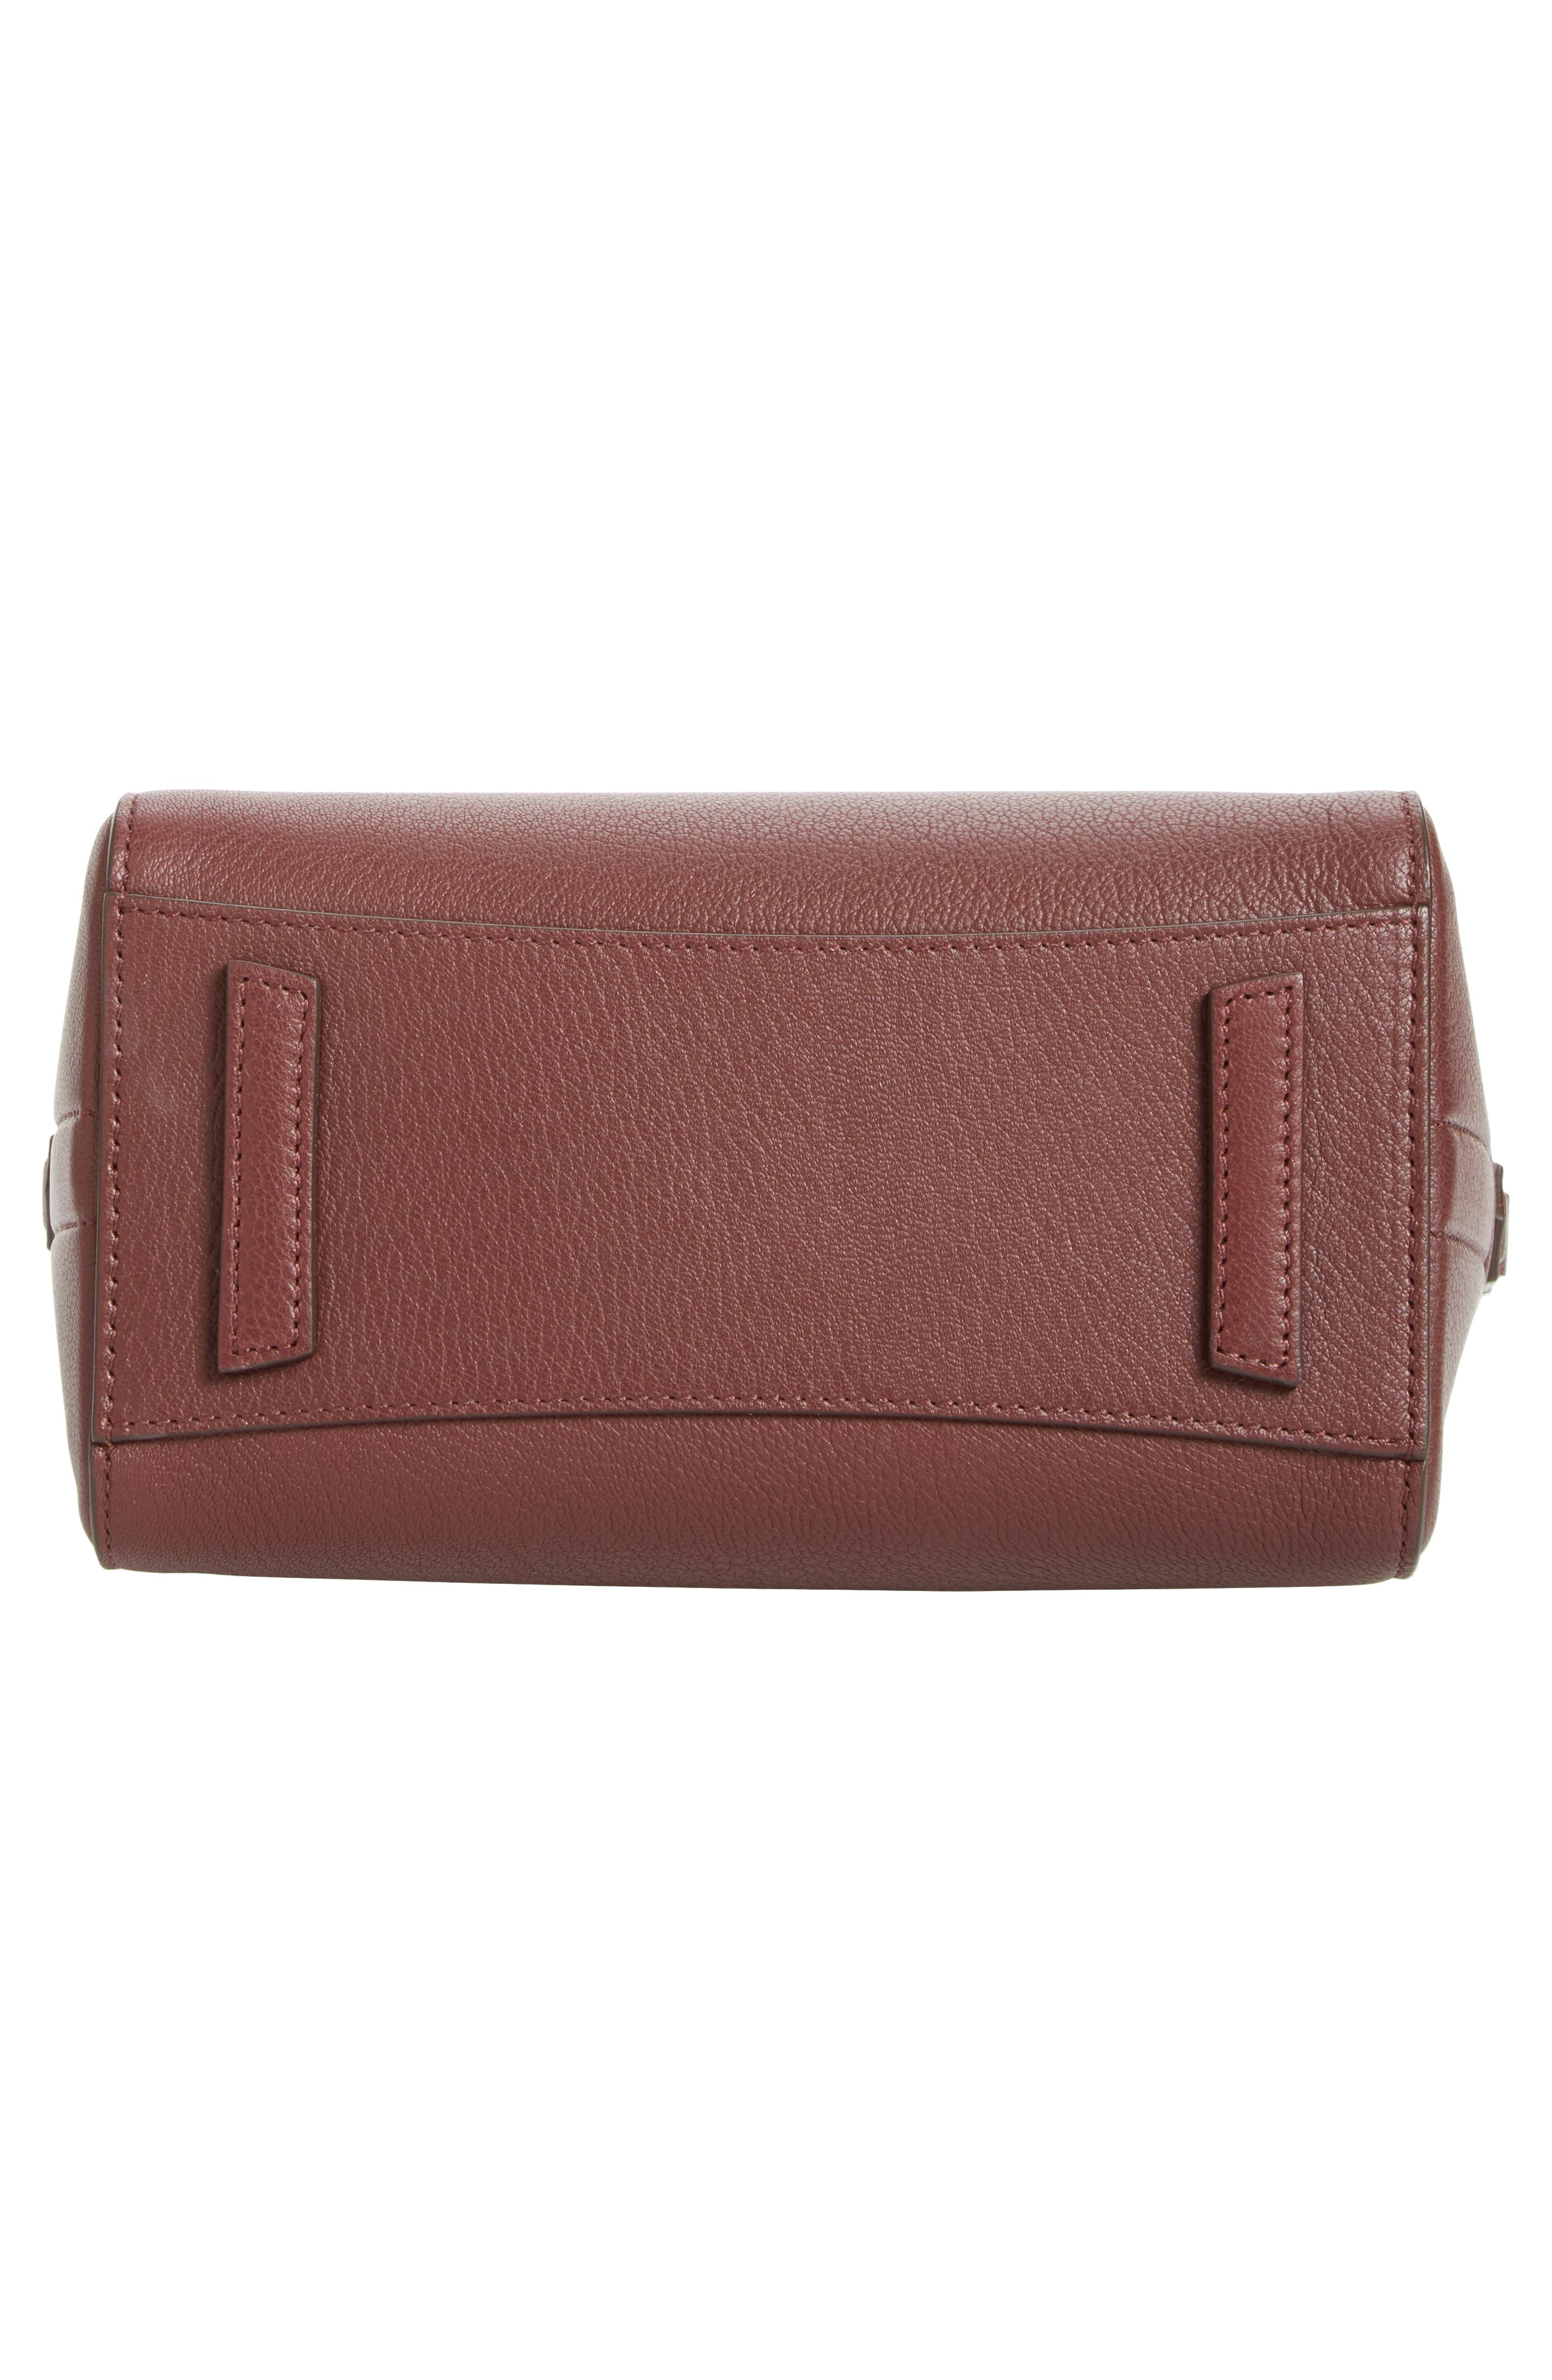 Mini Antigona Leather Top Handle Satchel,                             Alternate thumbnail 6, color,                             Burgundy/ Pink